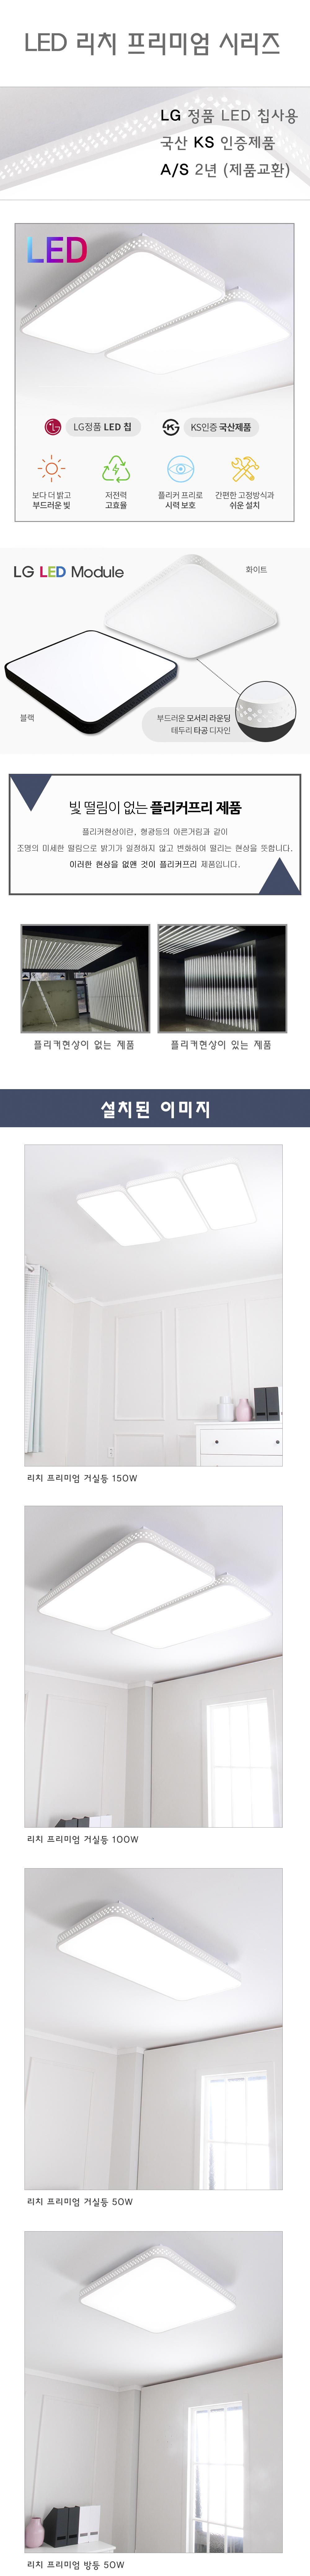 LED 일체형 리치 프리미엄 주방등 25W - 펀라이팅, 26,300원, 리빙조명, 방등/천장등